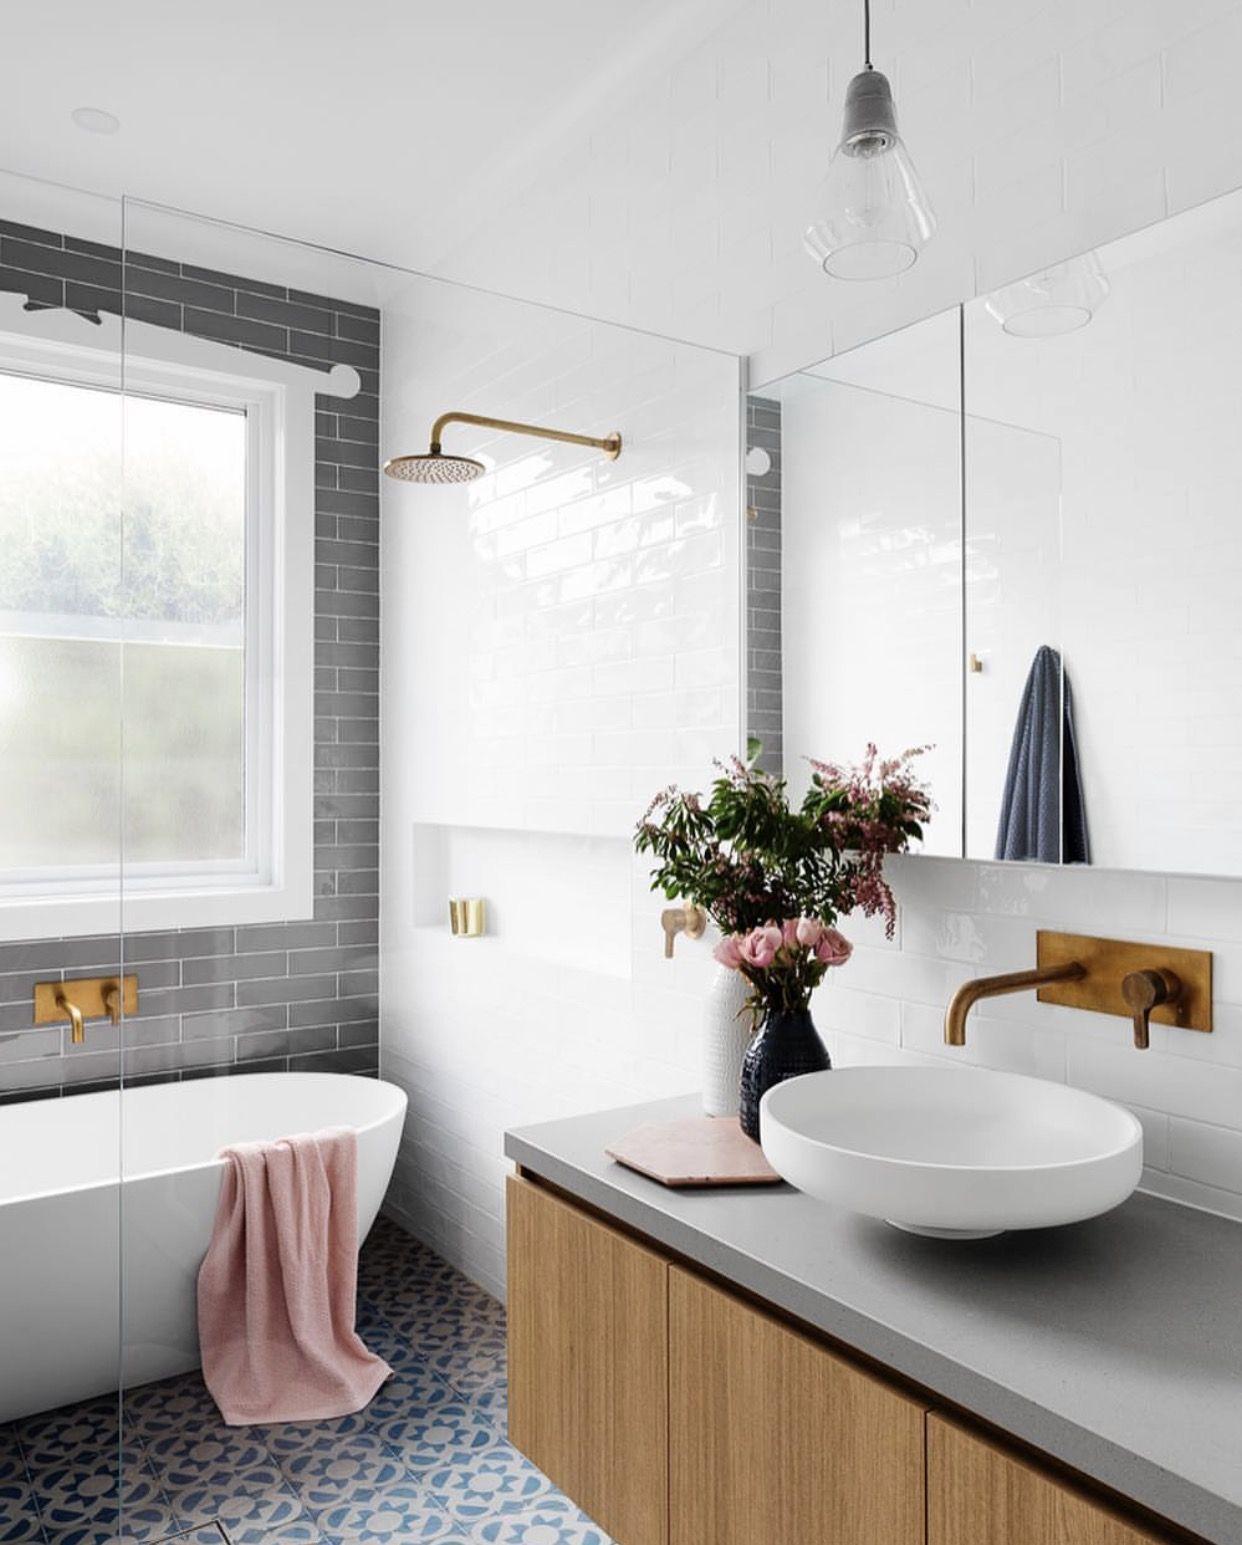 Pin by jean bond on small bathroom ideas pinterest interior